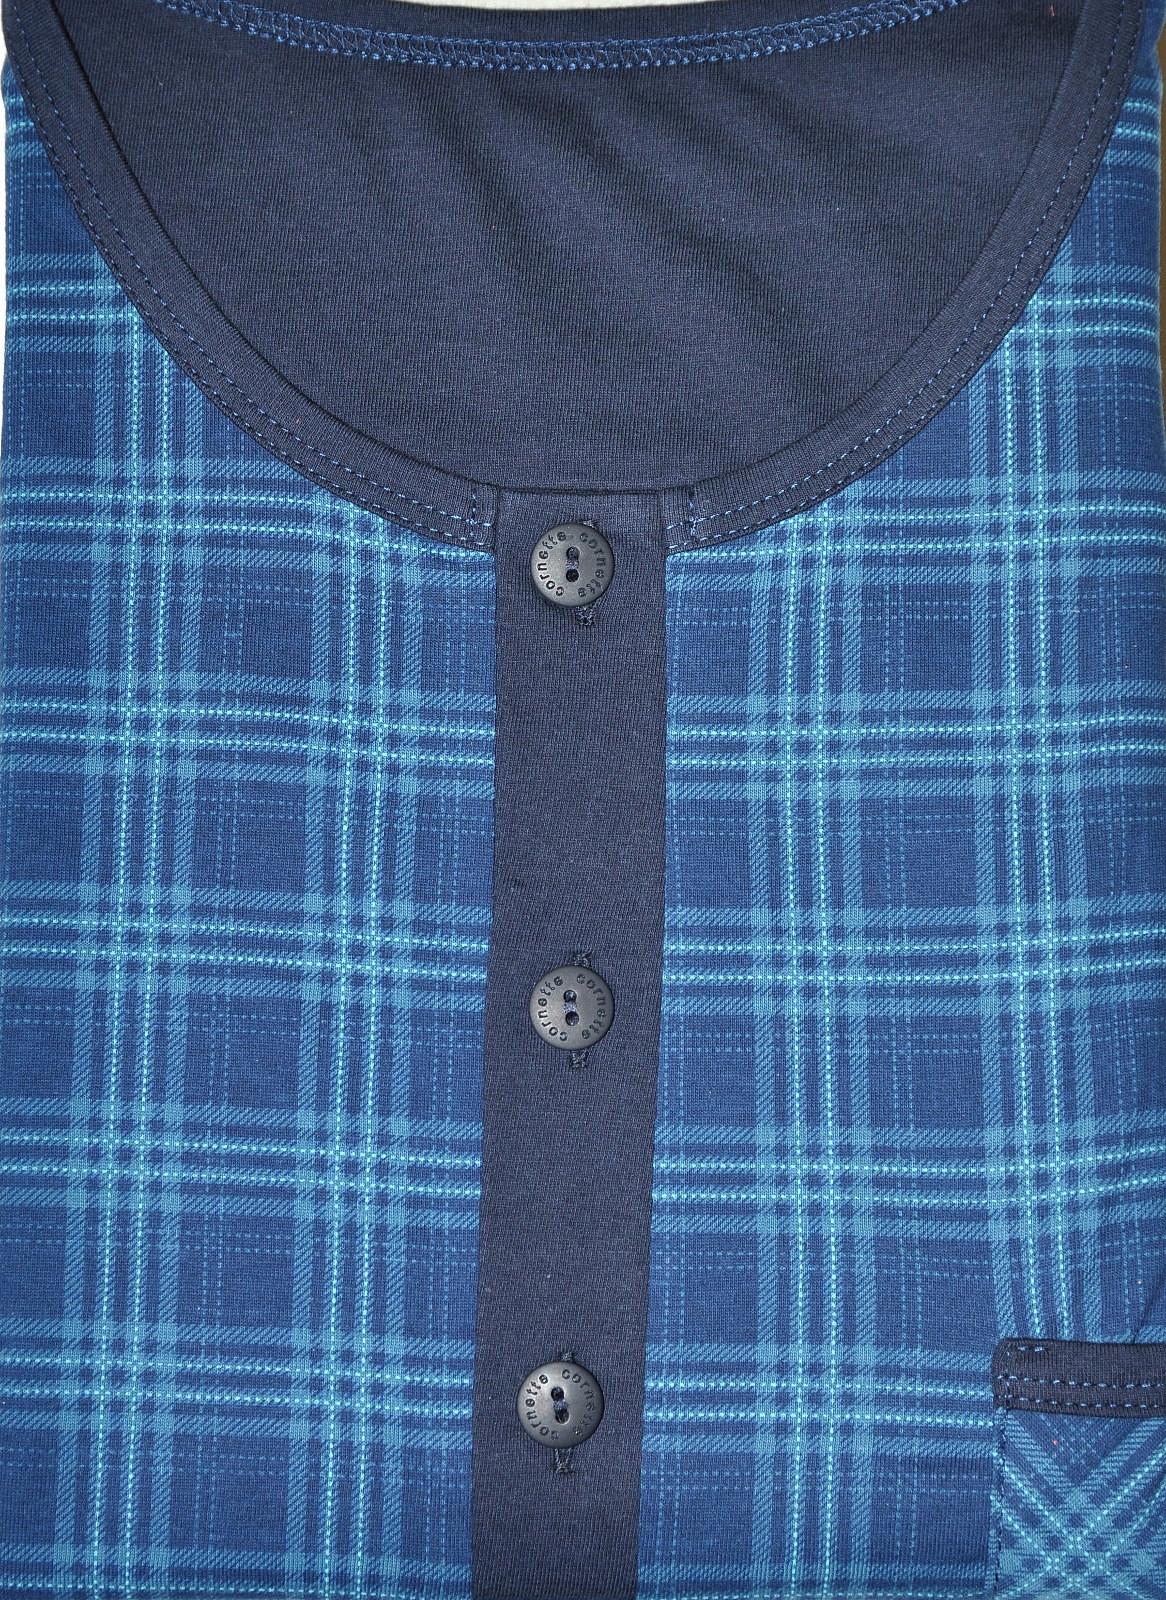 Koszula Nocna Męska Cornette Roz.L Krótki Rękaw